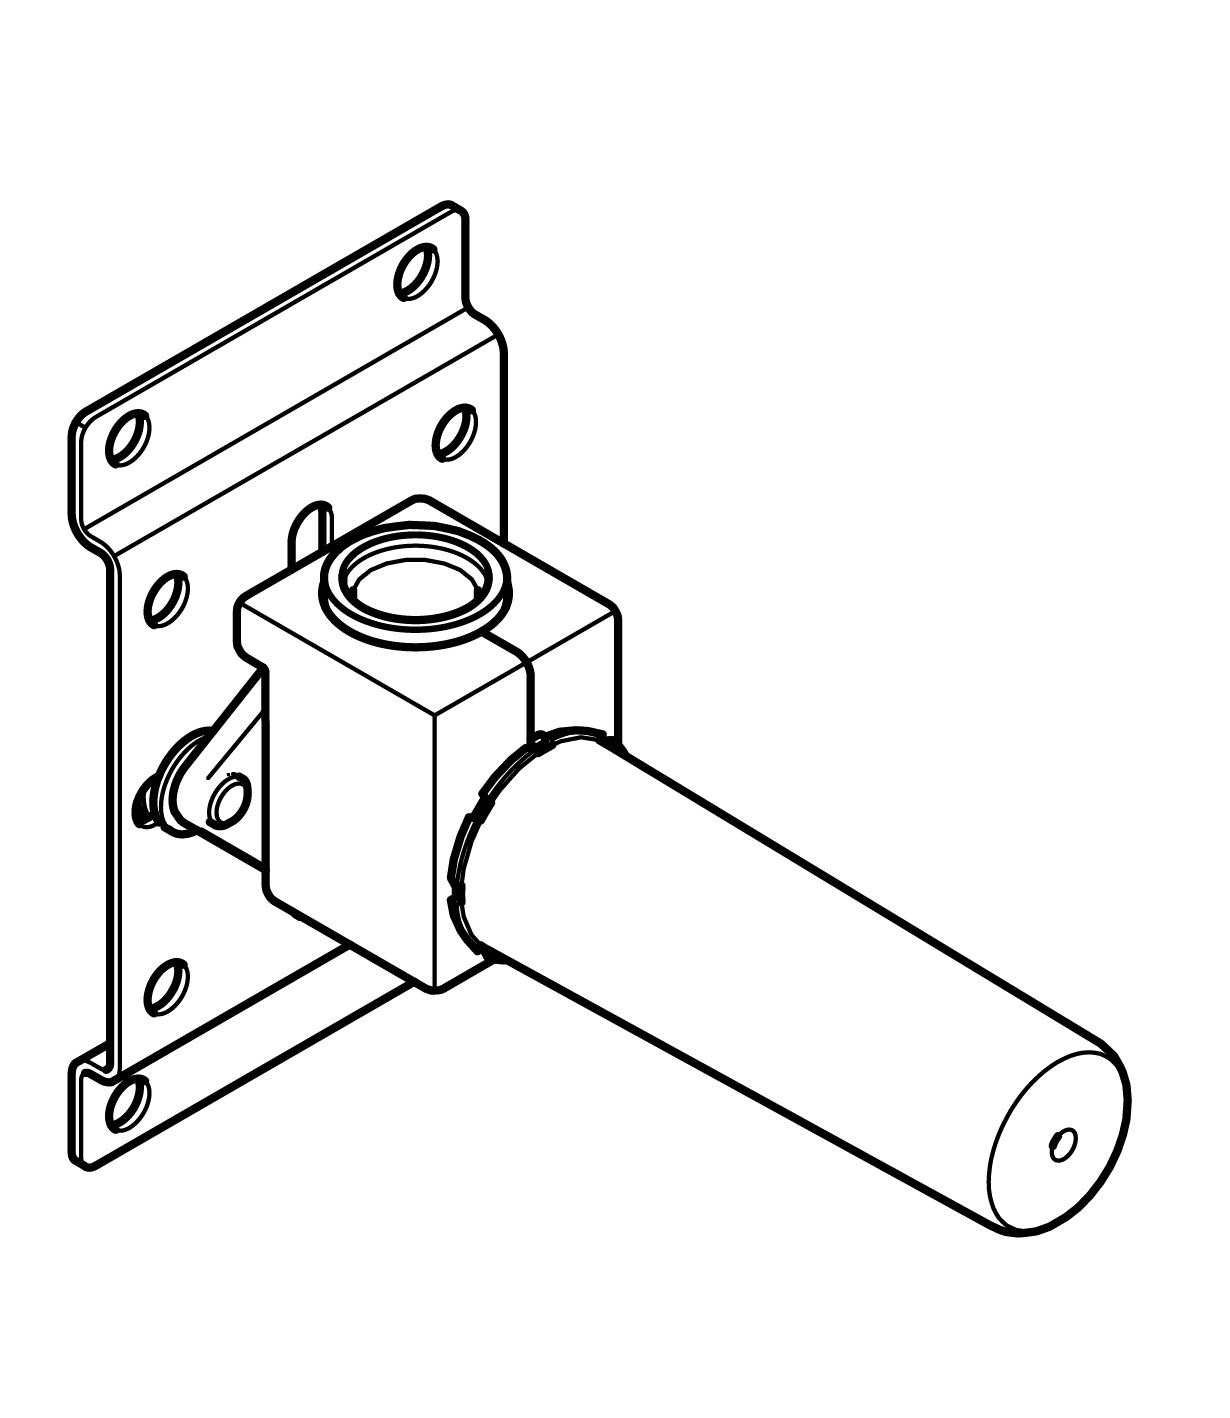 Dorr D90100 90-100mm Focusing Gear Ring Electronics